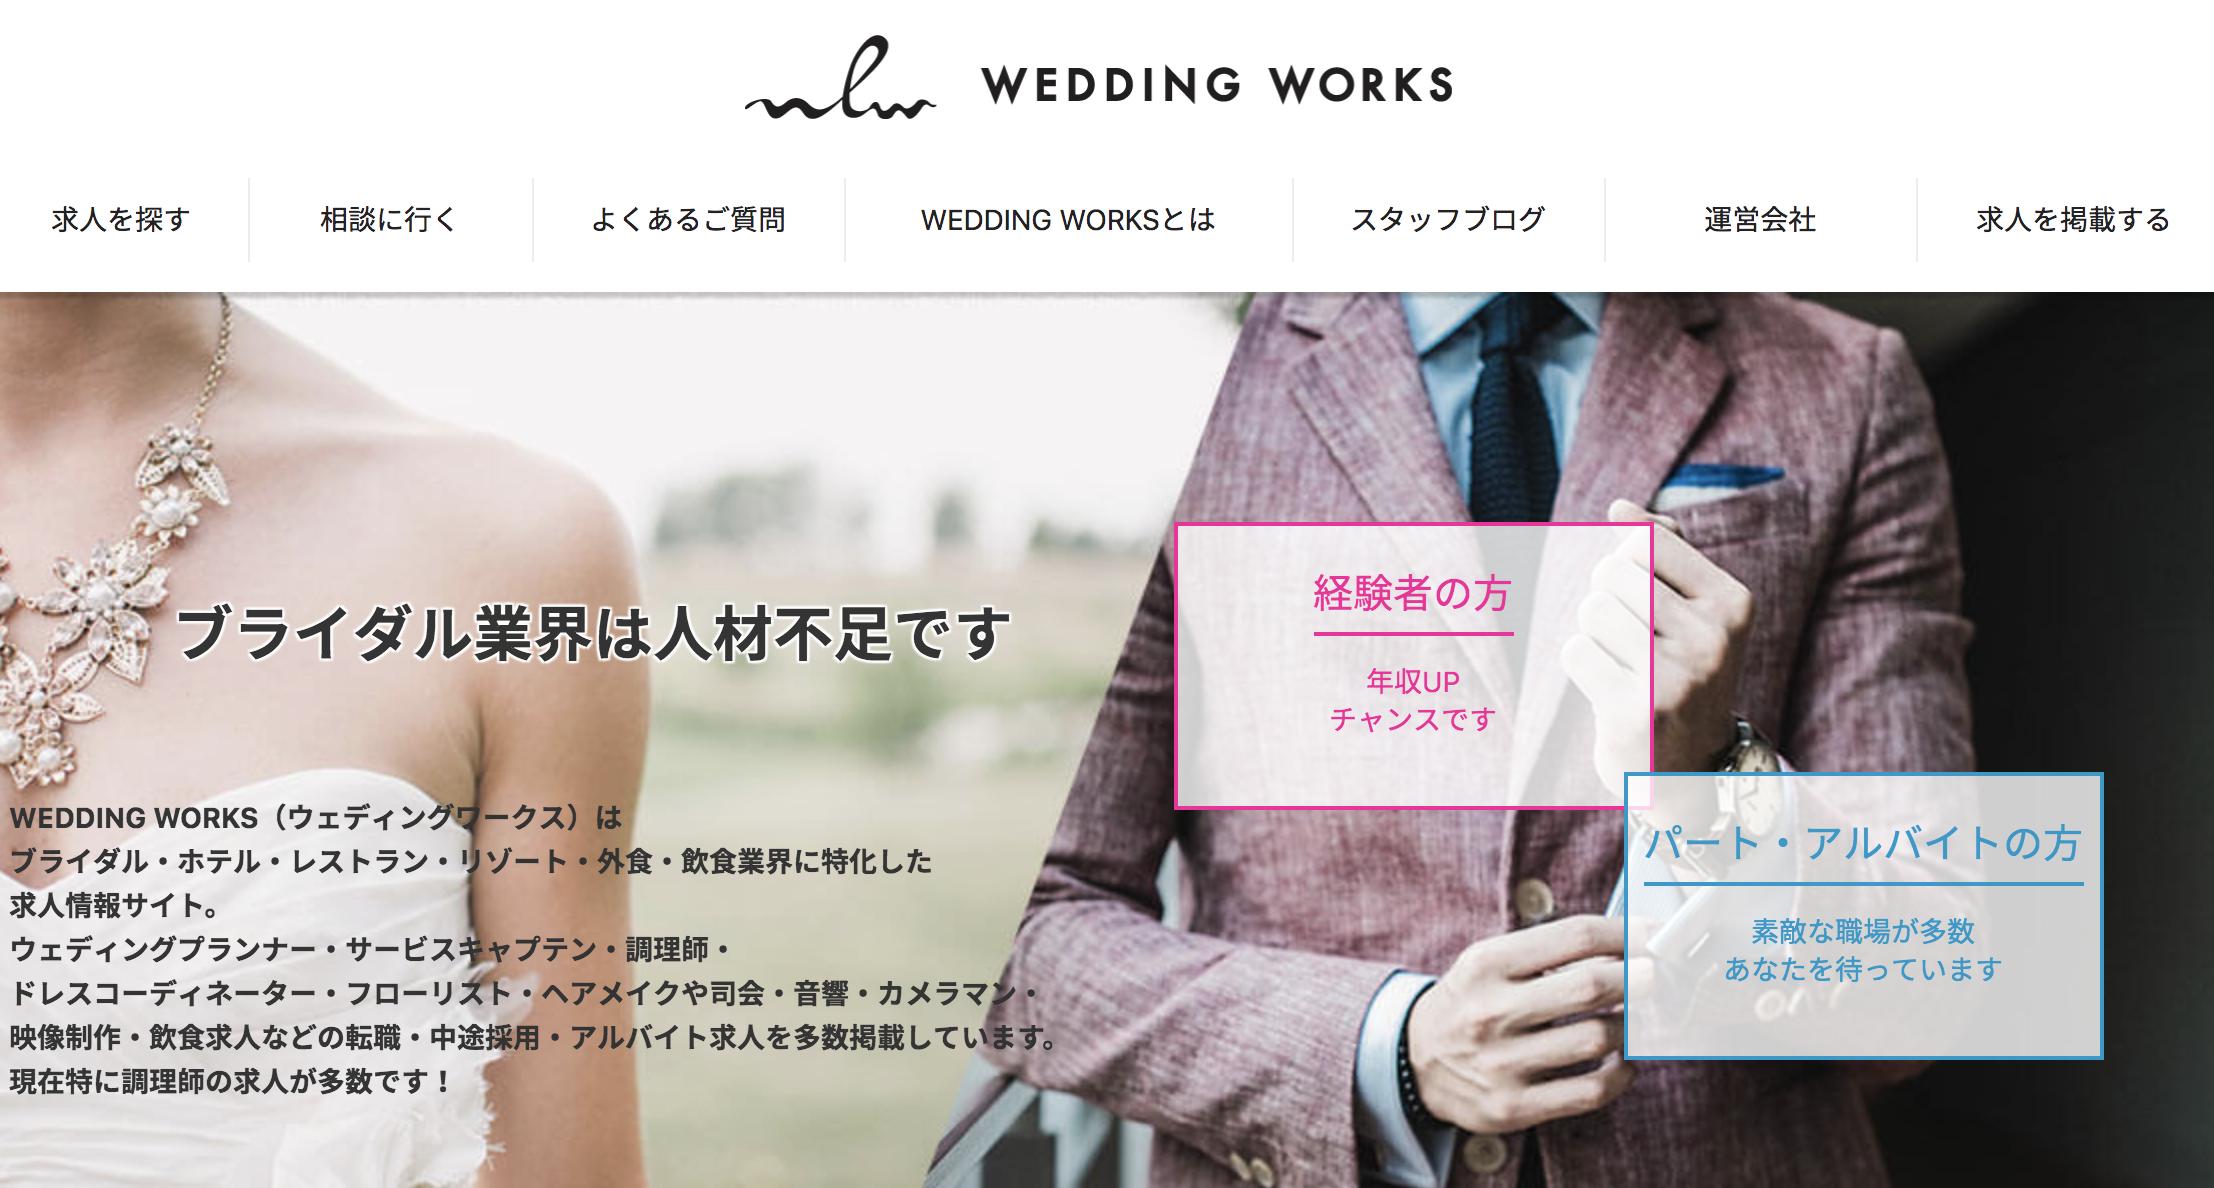 WEDDING WORKSの特徴について